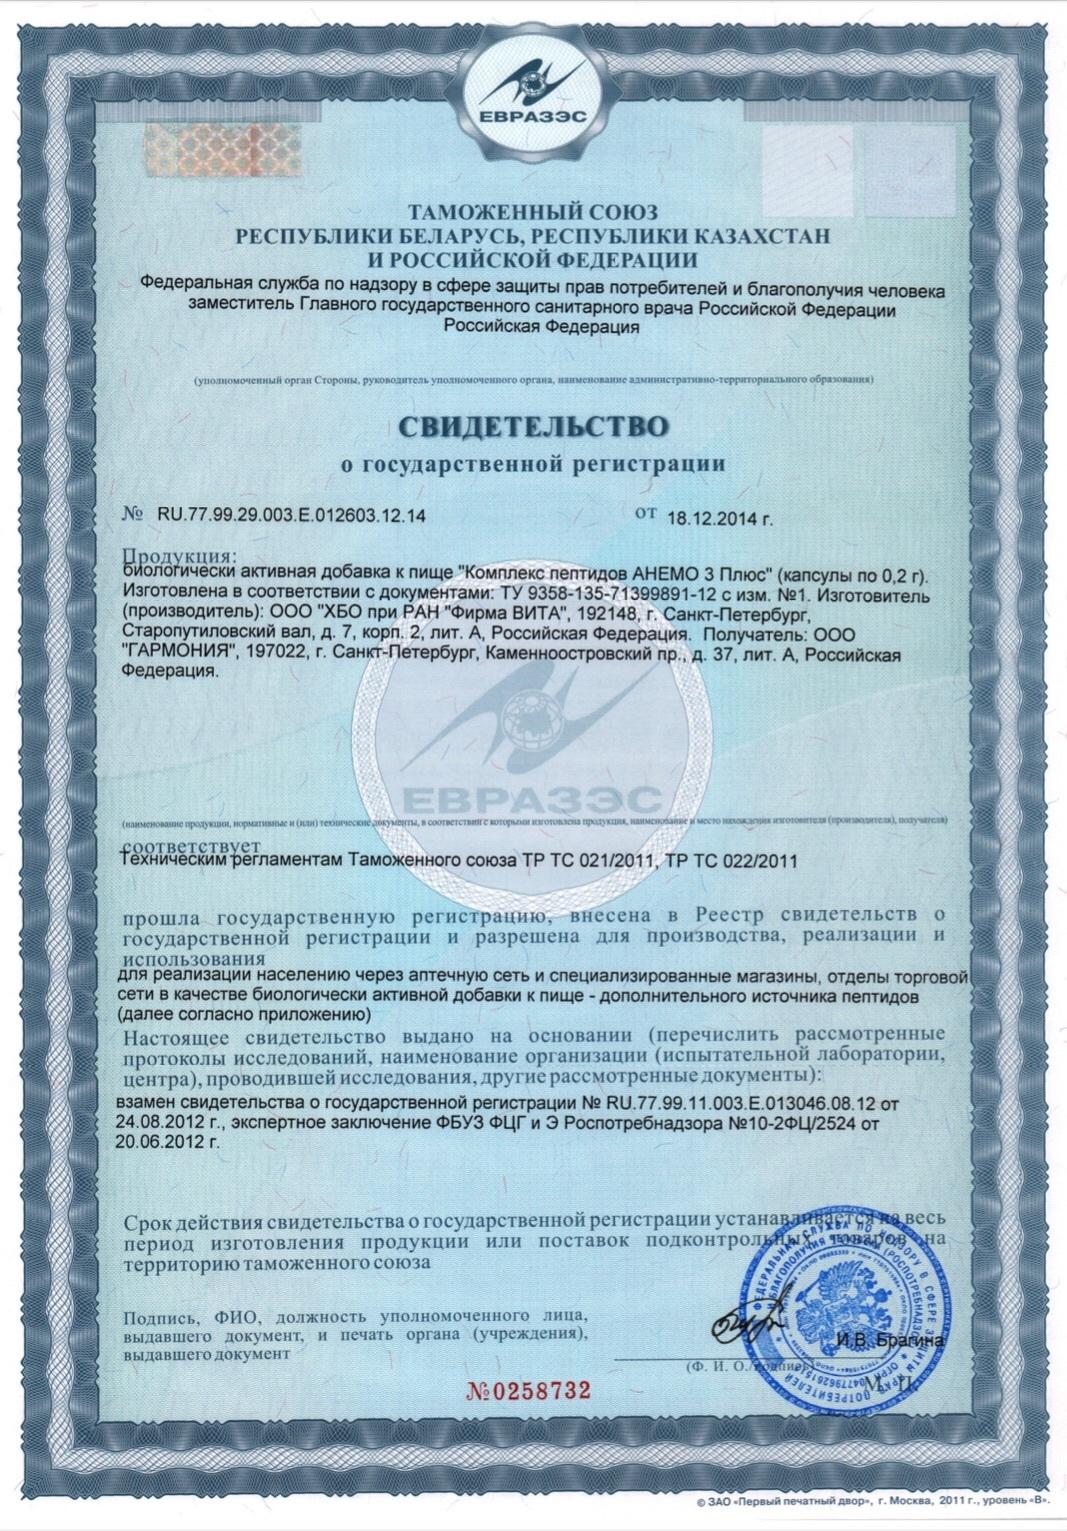 ANEMO 3 Plus® сертификат на пептиды